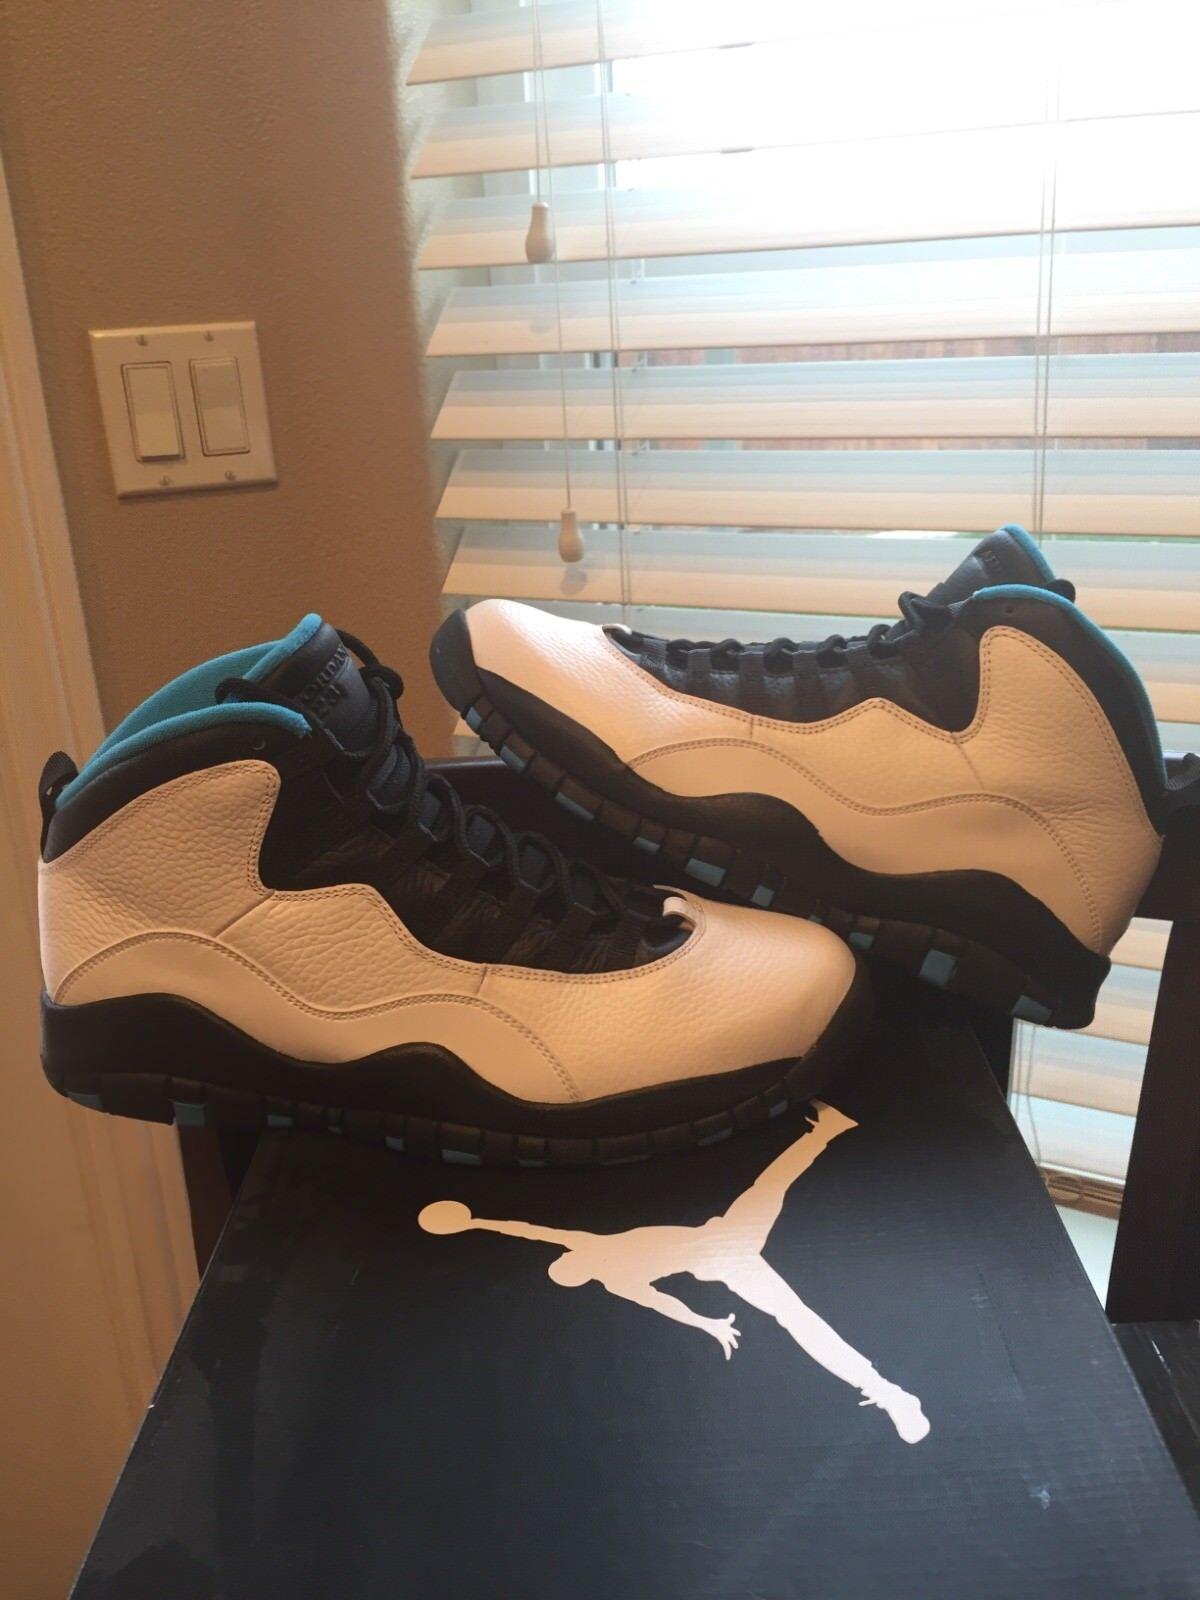 2014 Air Jordan Retro 10 X Powder Blue 310805 106 Size 10